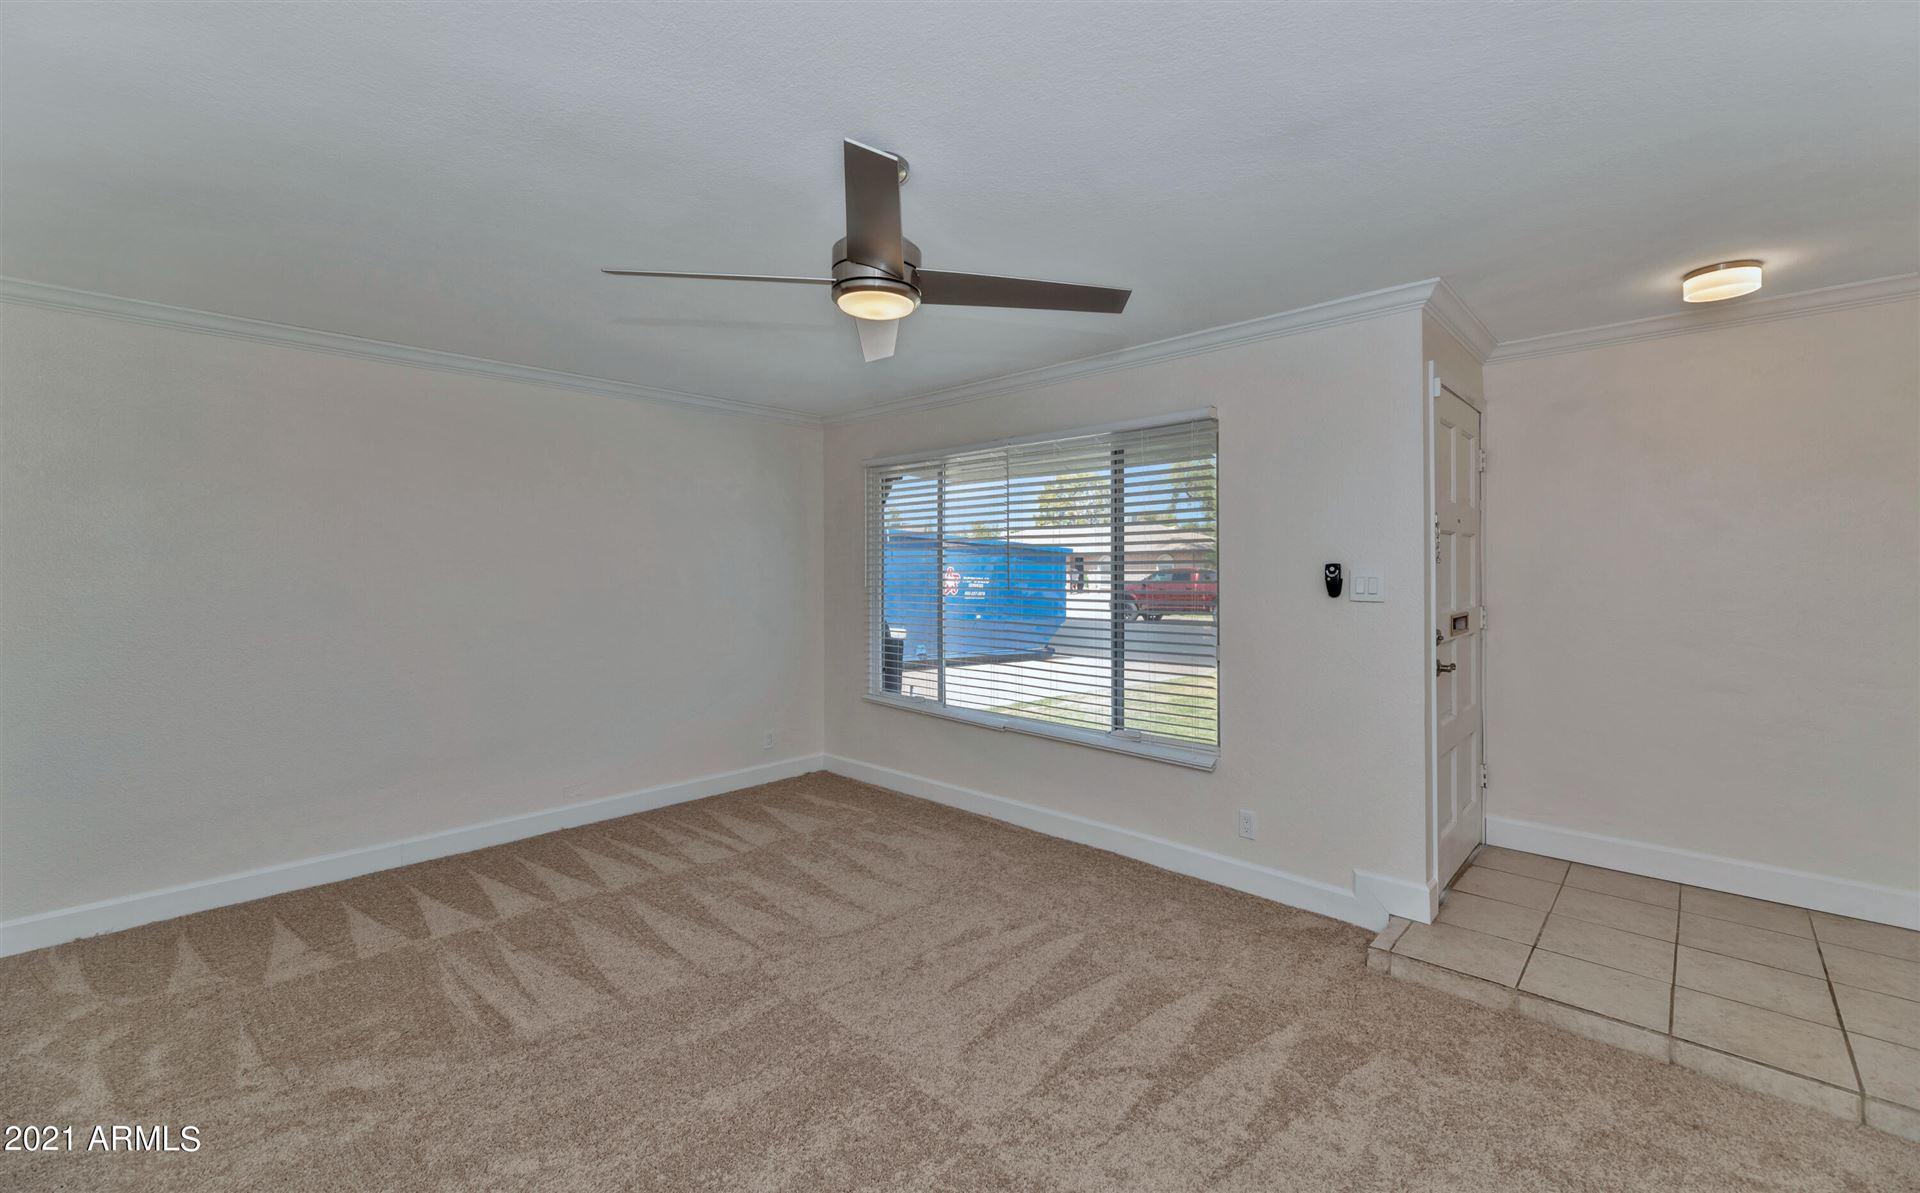 Photo of 2501 E BALBOA Drive, Tempe, AZ 85282 (MLS # 6294925)